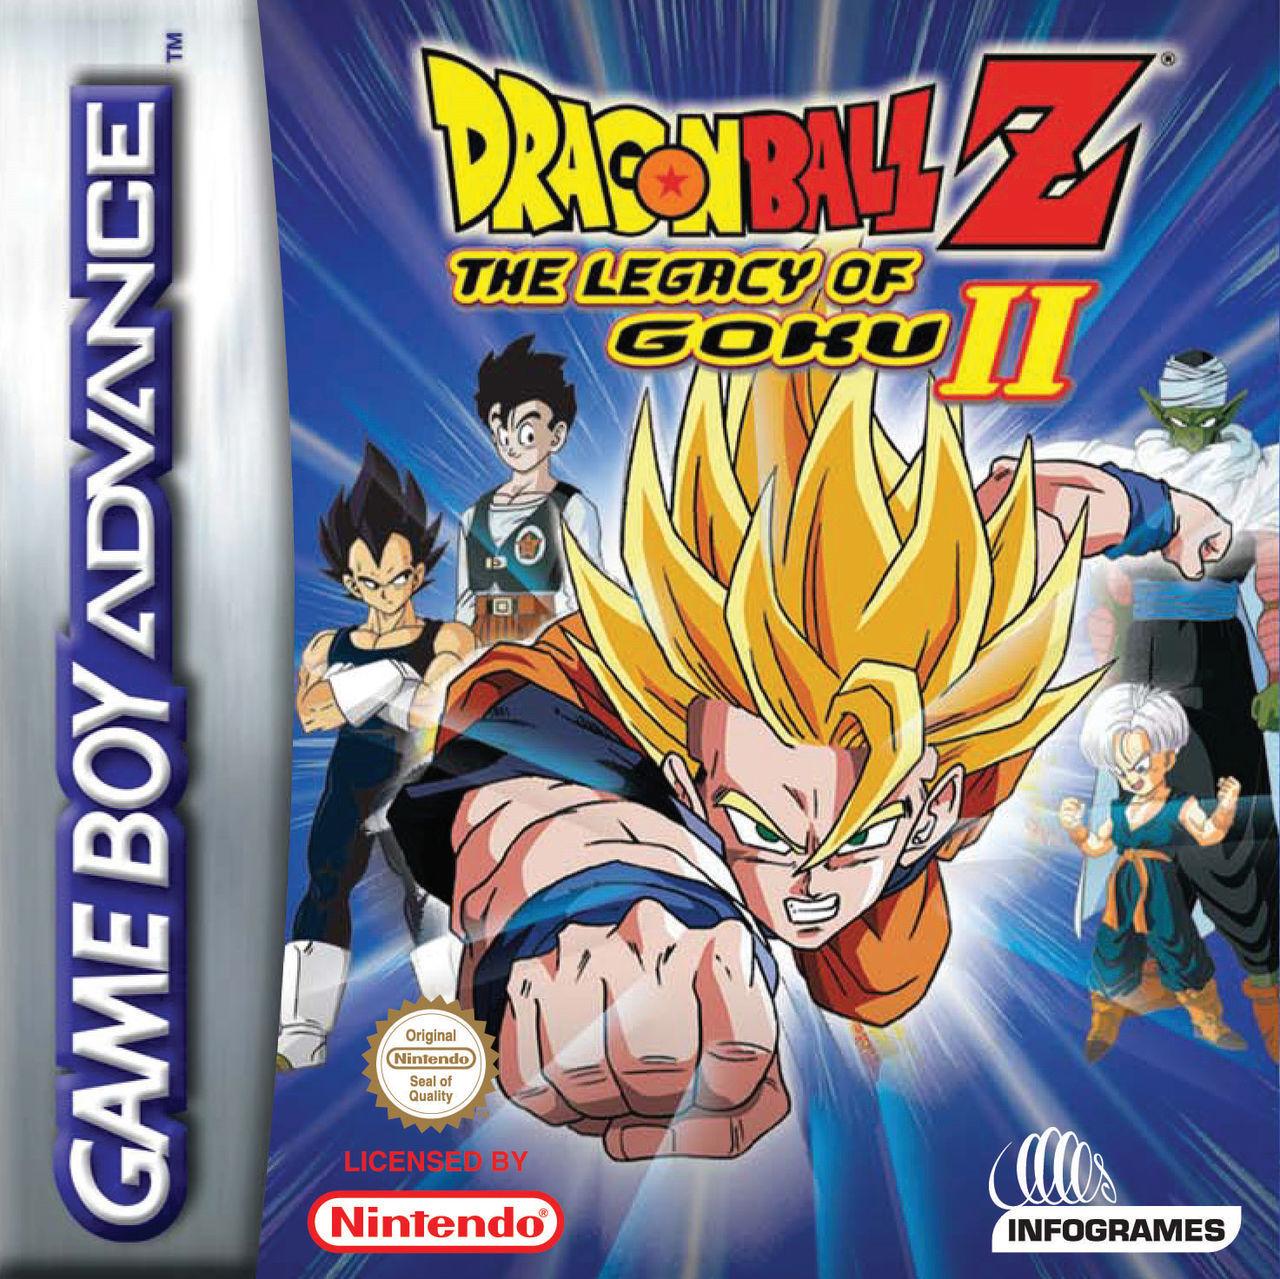 Dragon ball z legacy of goku 2 gameshark codes europe